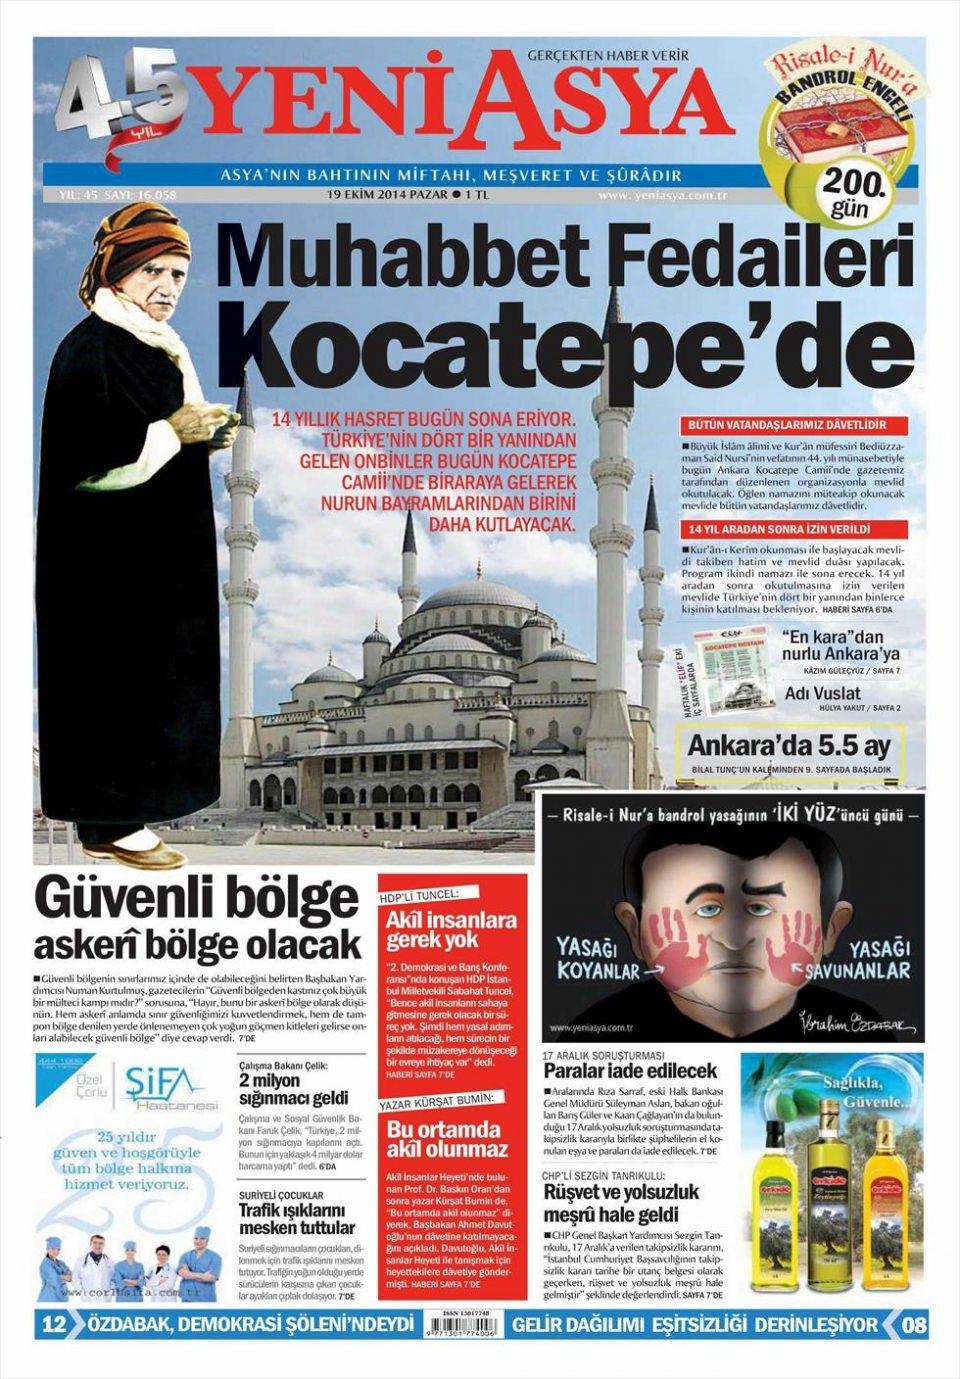 20 Ekim 2014 gazete manşetleri 23